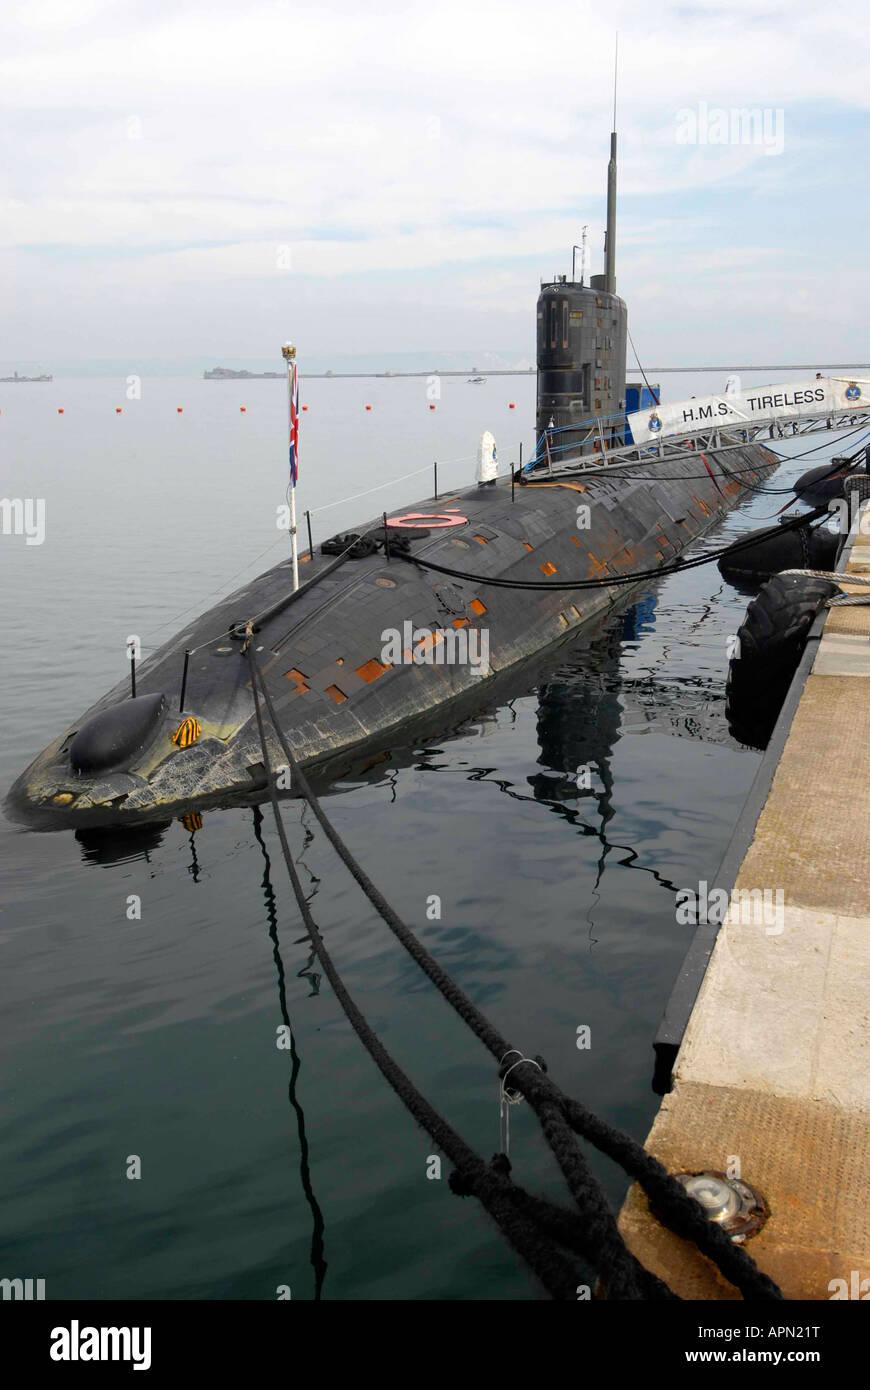 HMS Tireless nuclear submarine (S88) - Stock Image